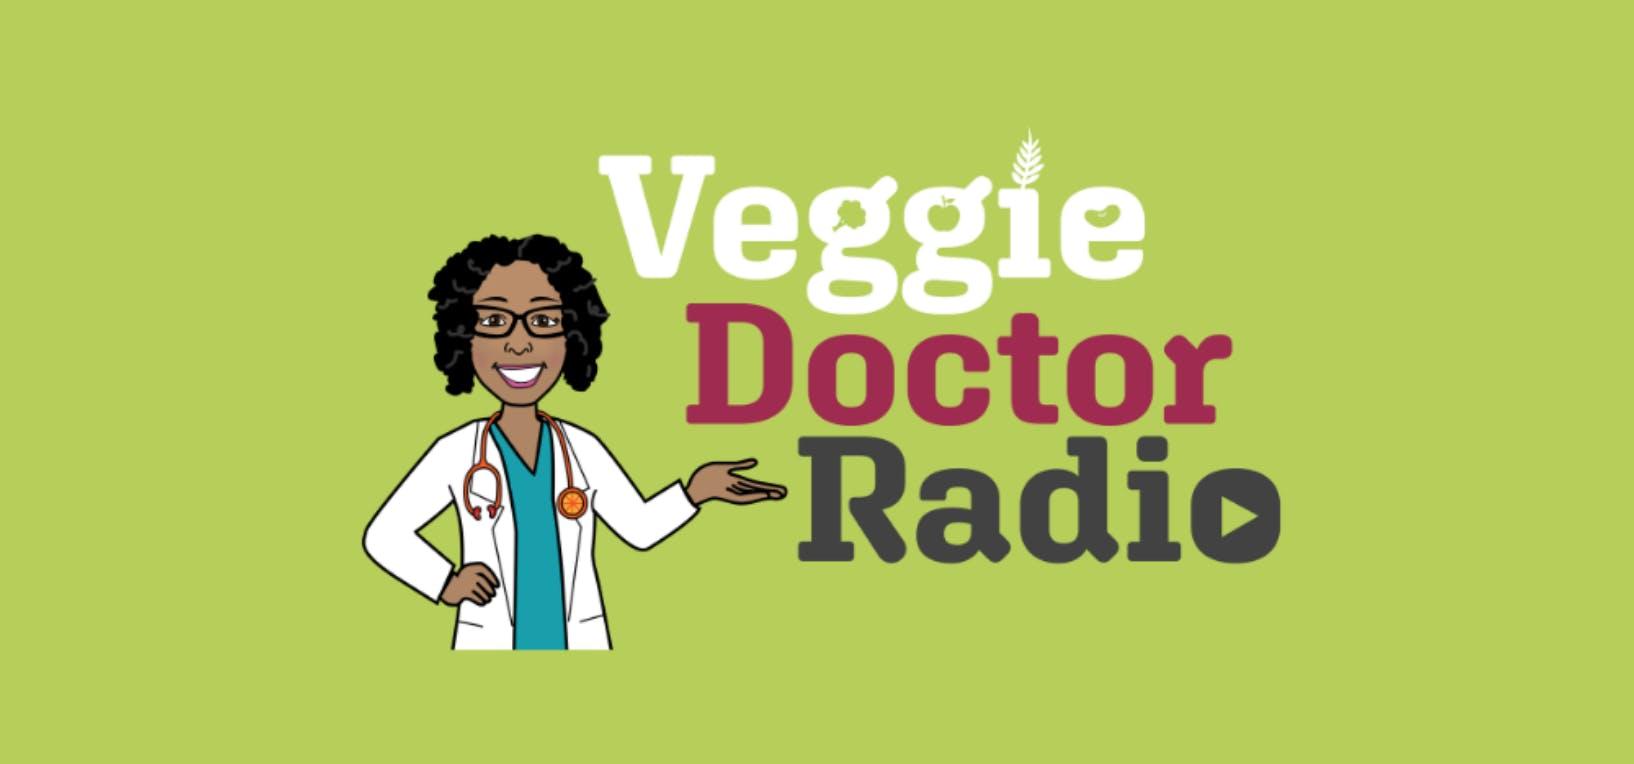 veggie doctor cartoon